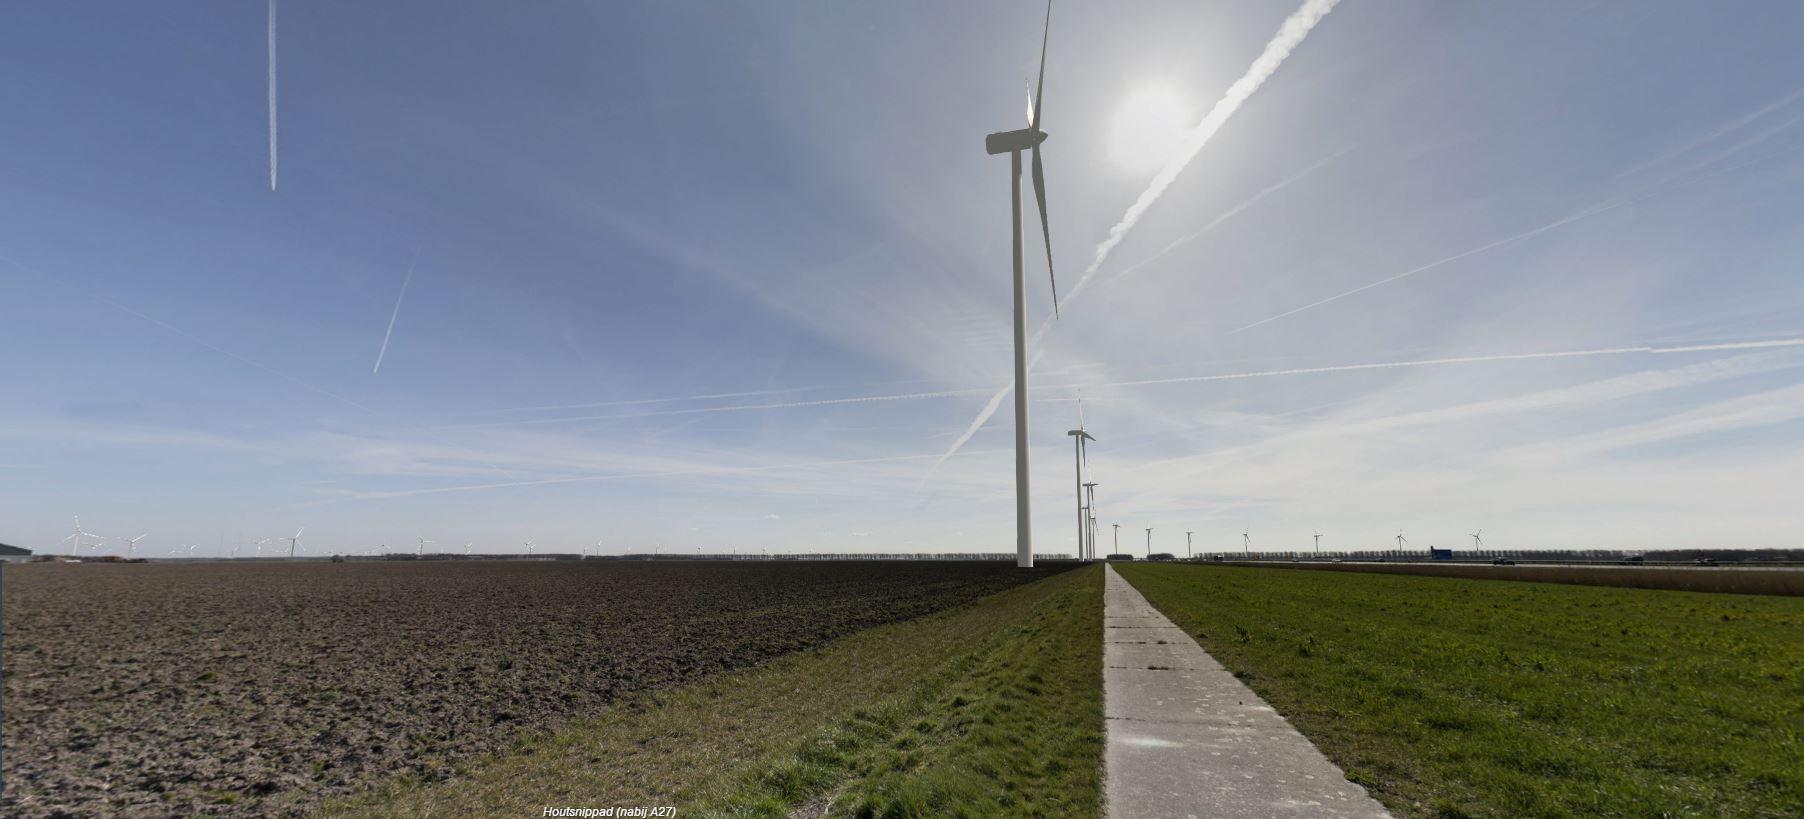 Commissie m.e.r. positief over MER windpark Zeewolde